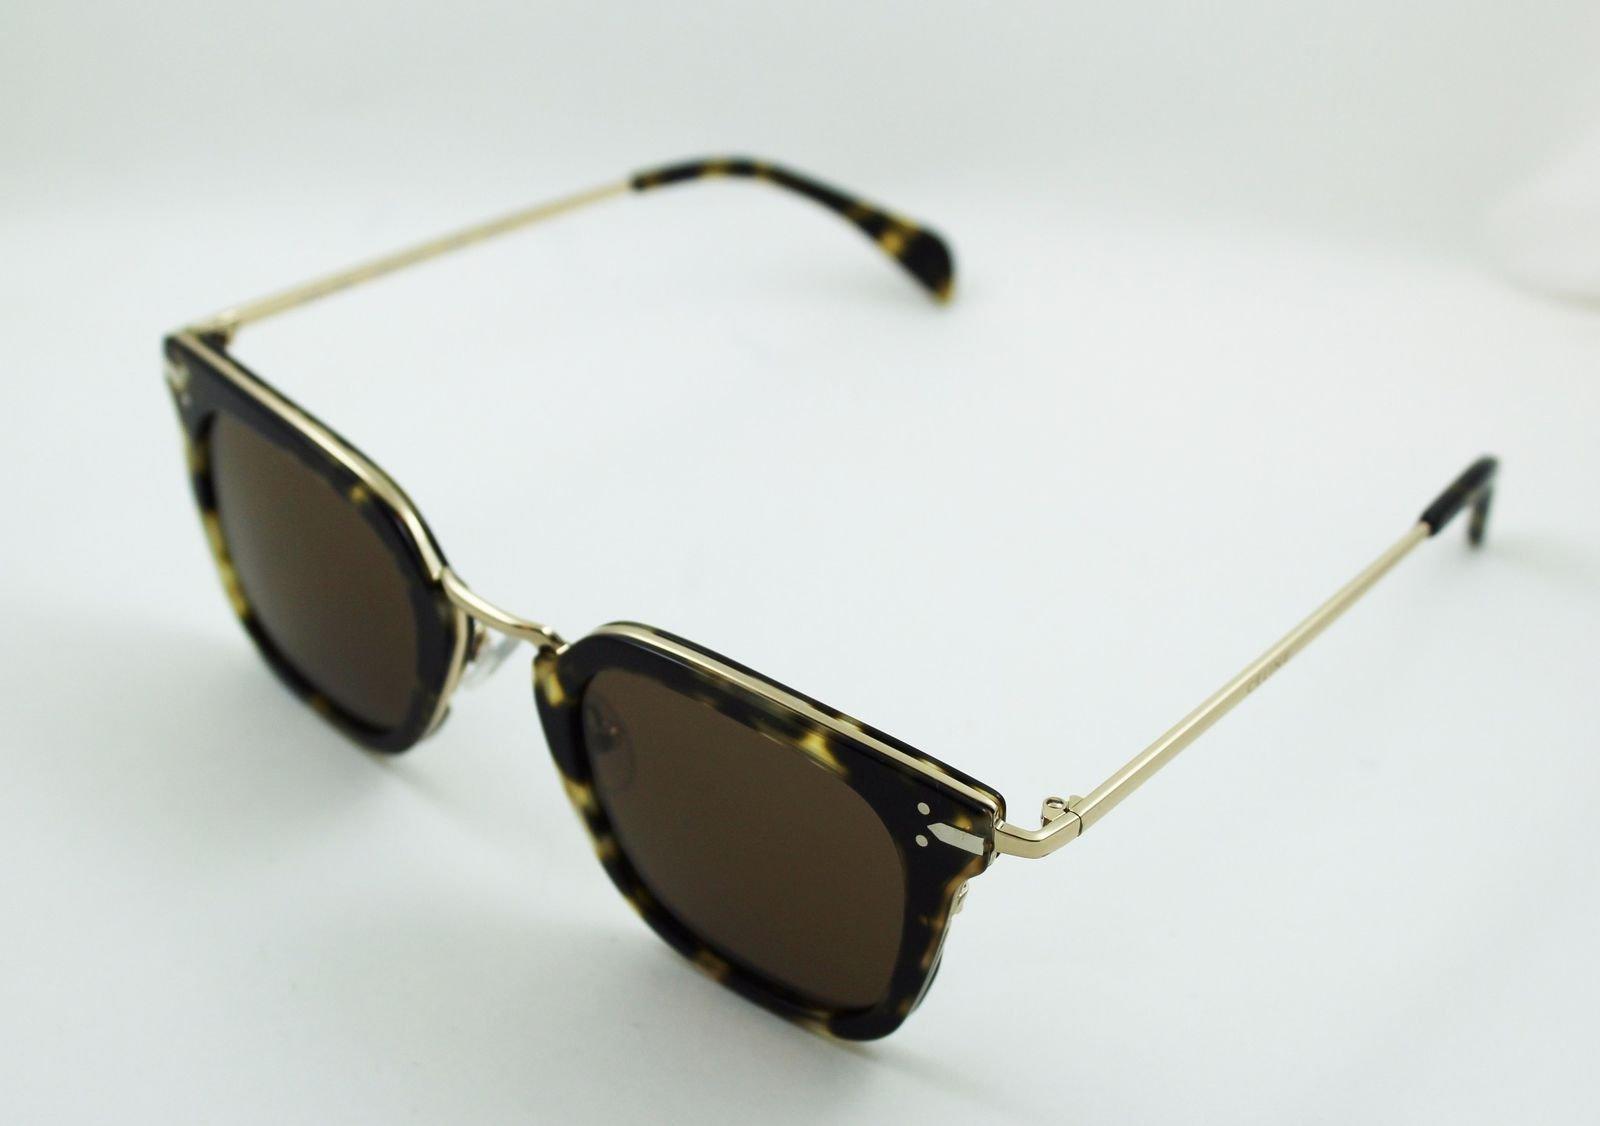 fb1144b83d3 Celine CL41402 s Square Sunglasses Gold and Havana Green Frame Solid Brown  Lens